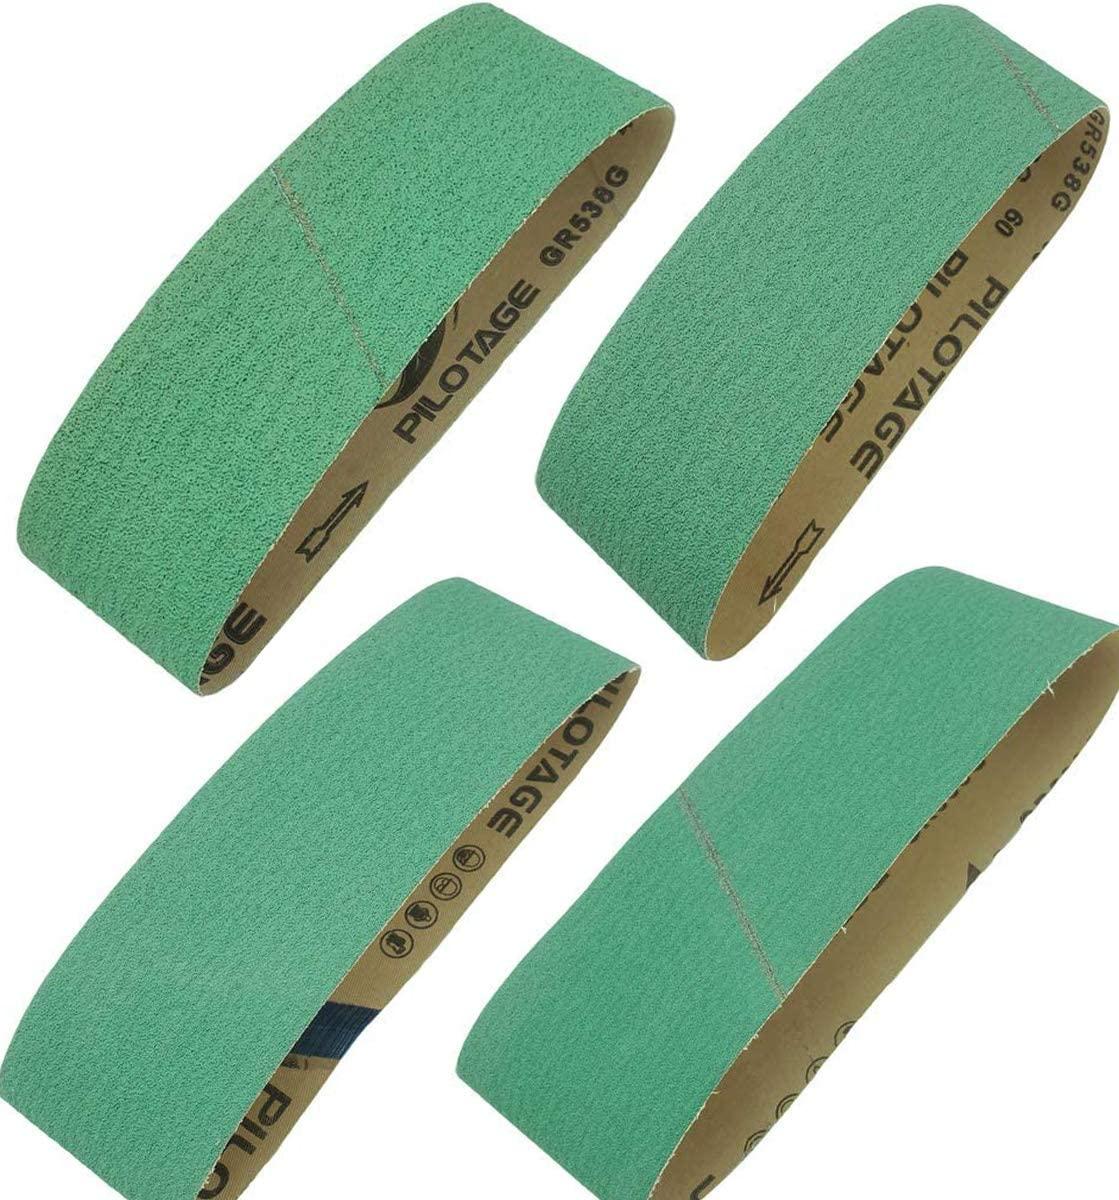 Sackorange 4 Inch x 36 Inch Metal Grinding Zirconia Sanding Belts - One Each of 40 80 100 and 120 Grits Sanding Belt, 4 Pack (4 X 36 Inch)